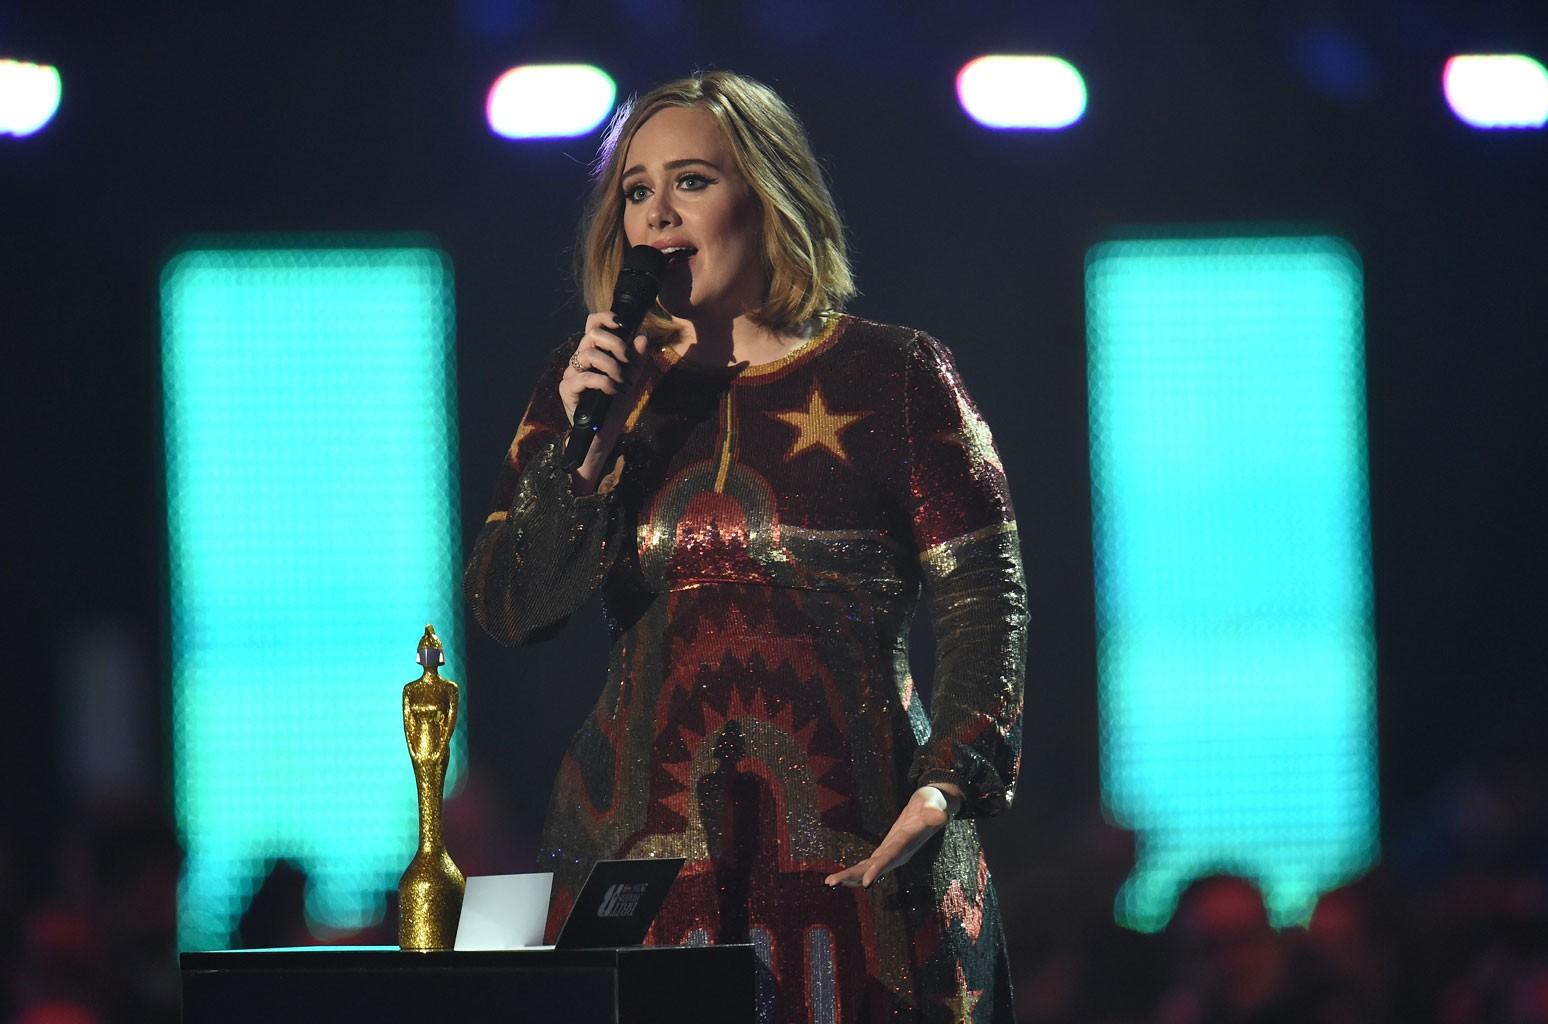 Dua Lipa, Adele & More Artists Nominated for Top Album at Brit Awards & Grammys